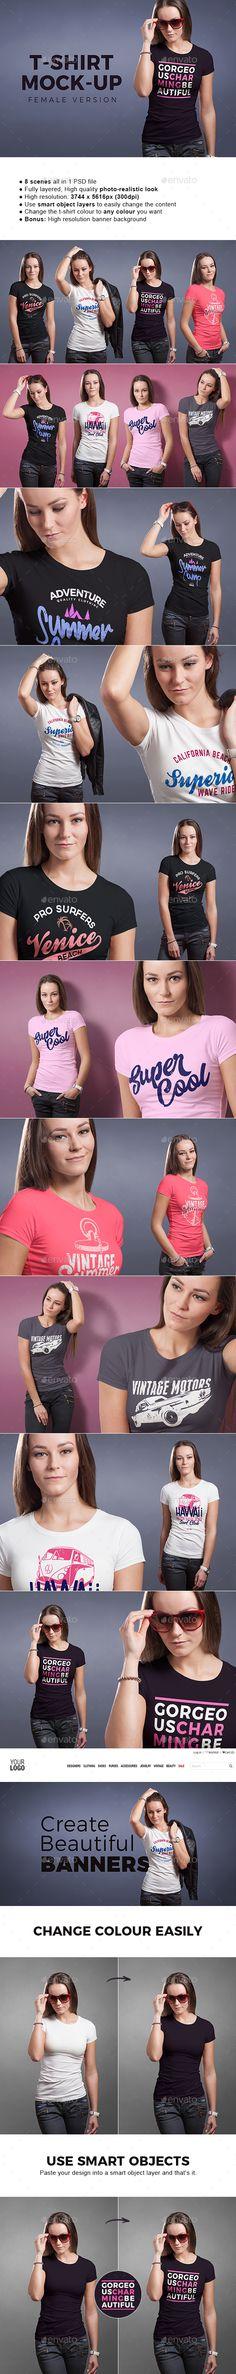 Female #T-shirt #Mock-up -#T-shirts Apparel